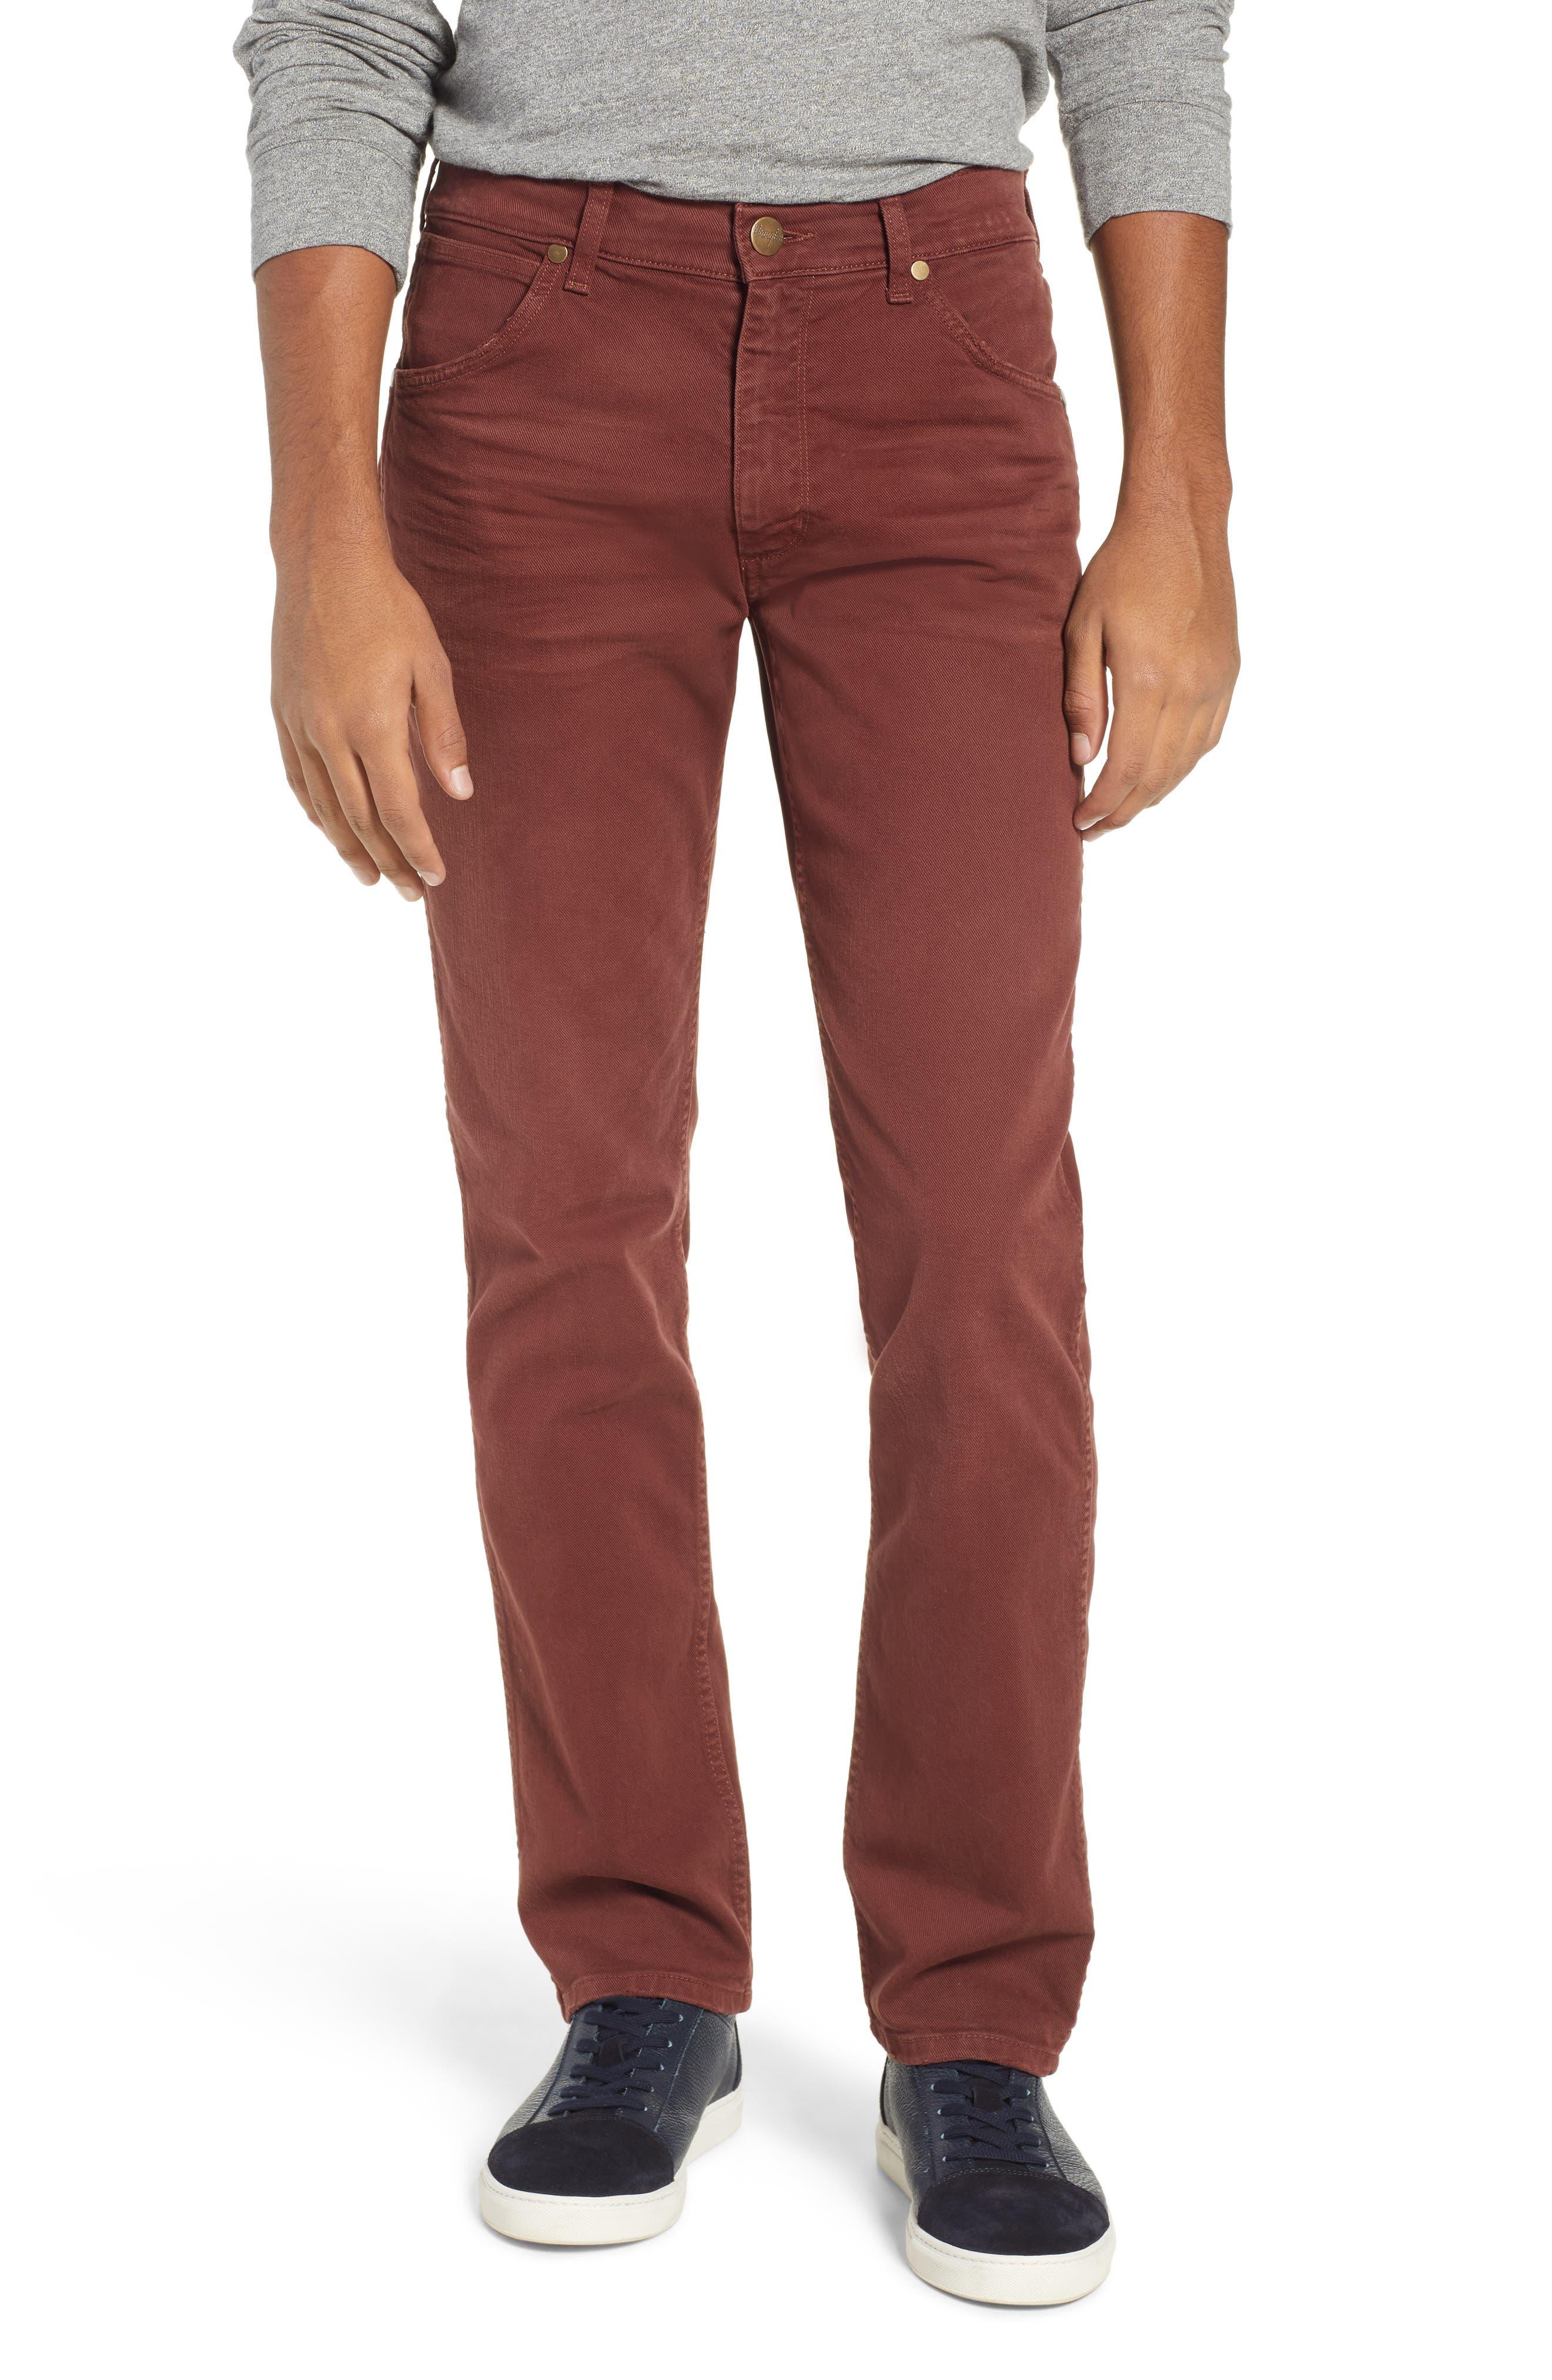 Greensboro Straight Leg Twill Pants, Main, color, MAHOGANY RED